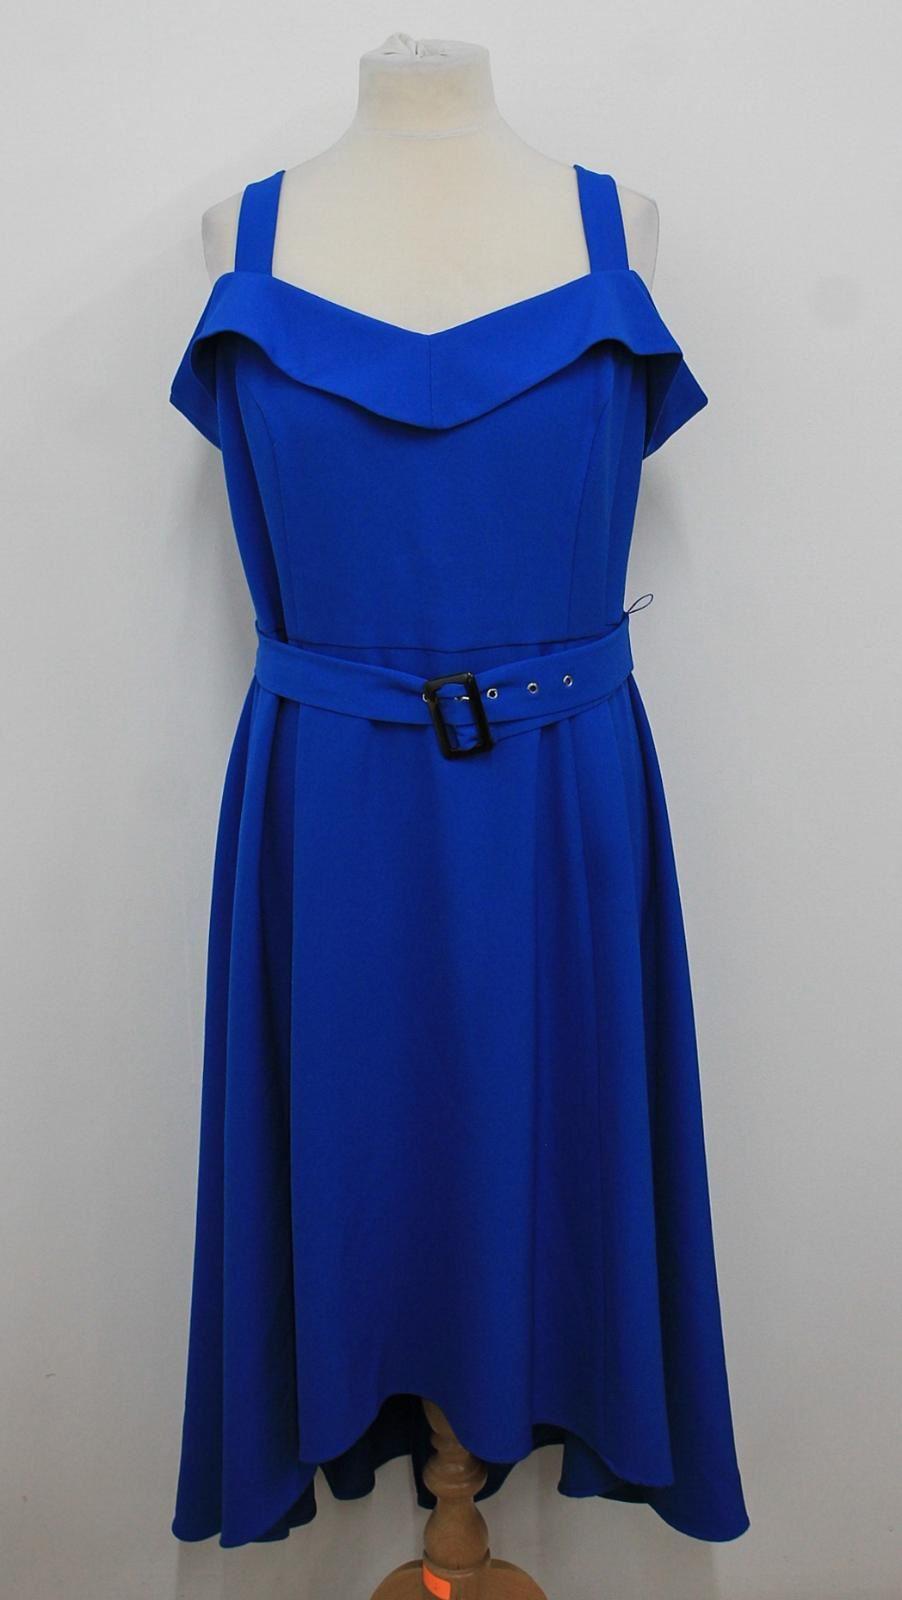 MONSOON-Ladies-Royal-Blue-Ruffled-Sweetheart-Neckline-Asymmetric-Dress-UK18